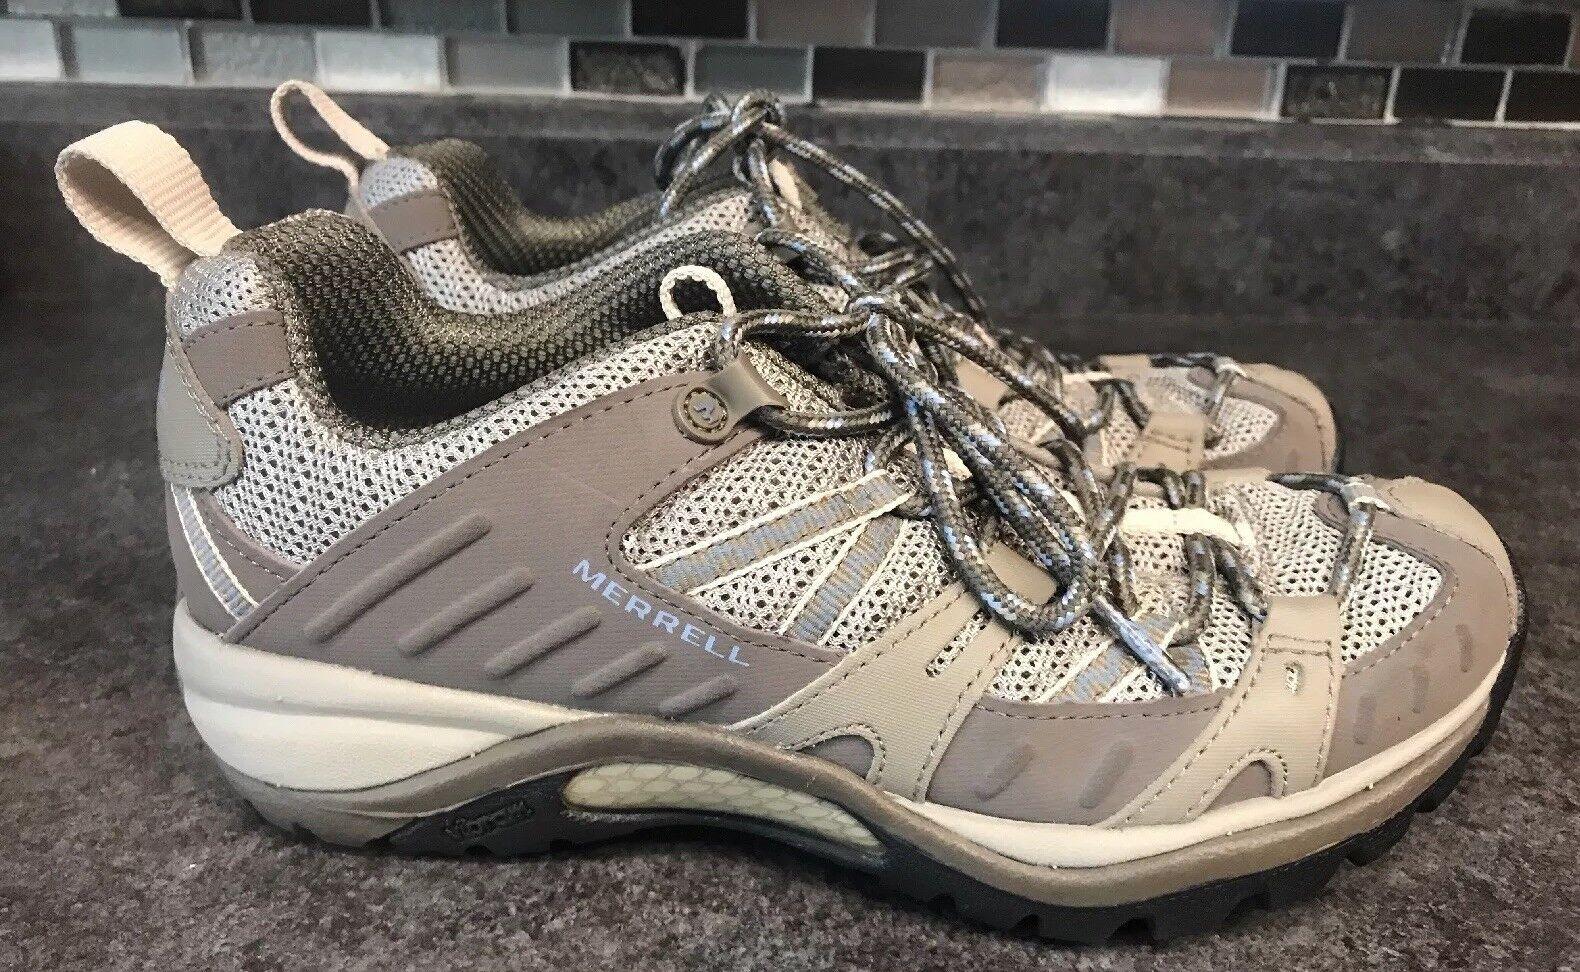 Women's Merrell Moab Dusty Olive WP Waterproof Trail Hiking shoes Size Sz US 6.5